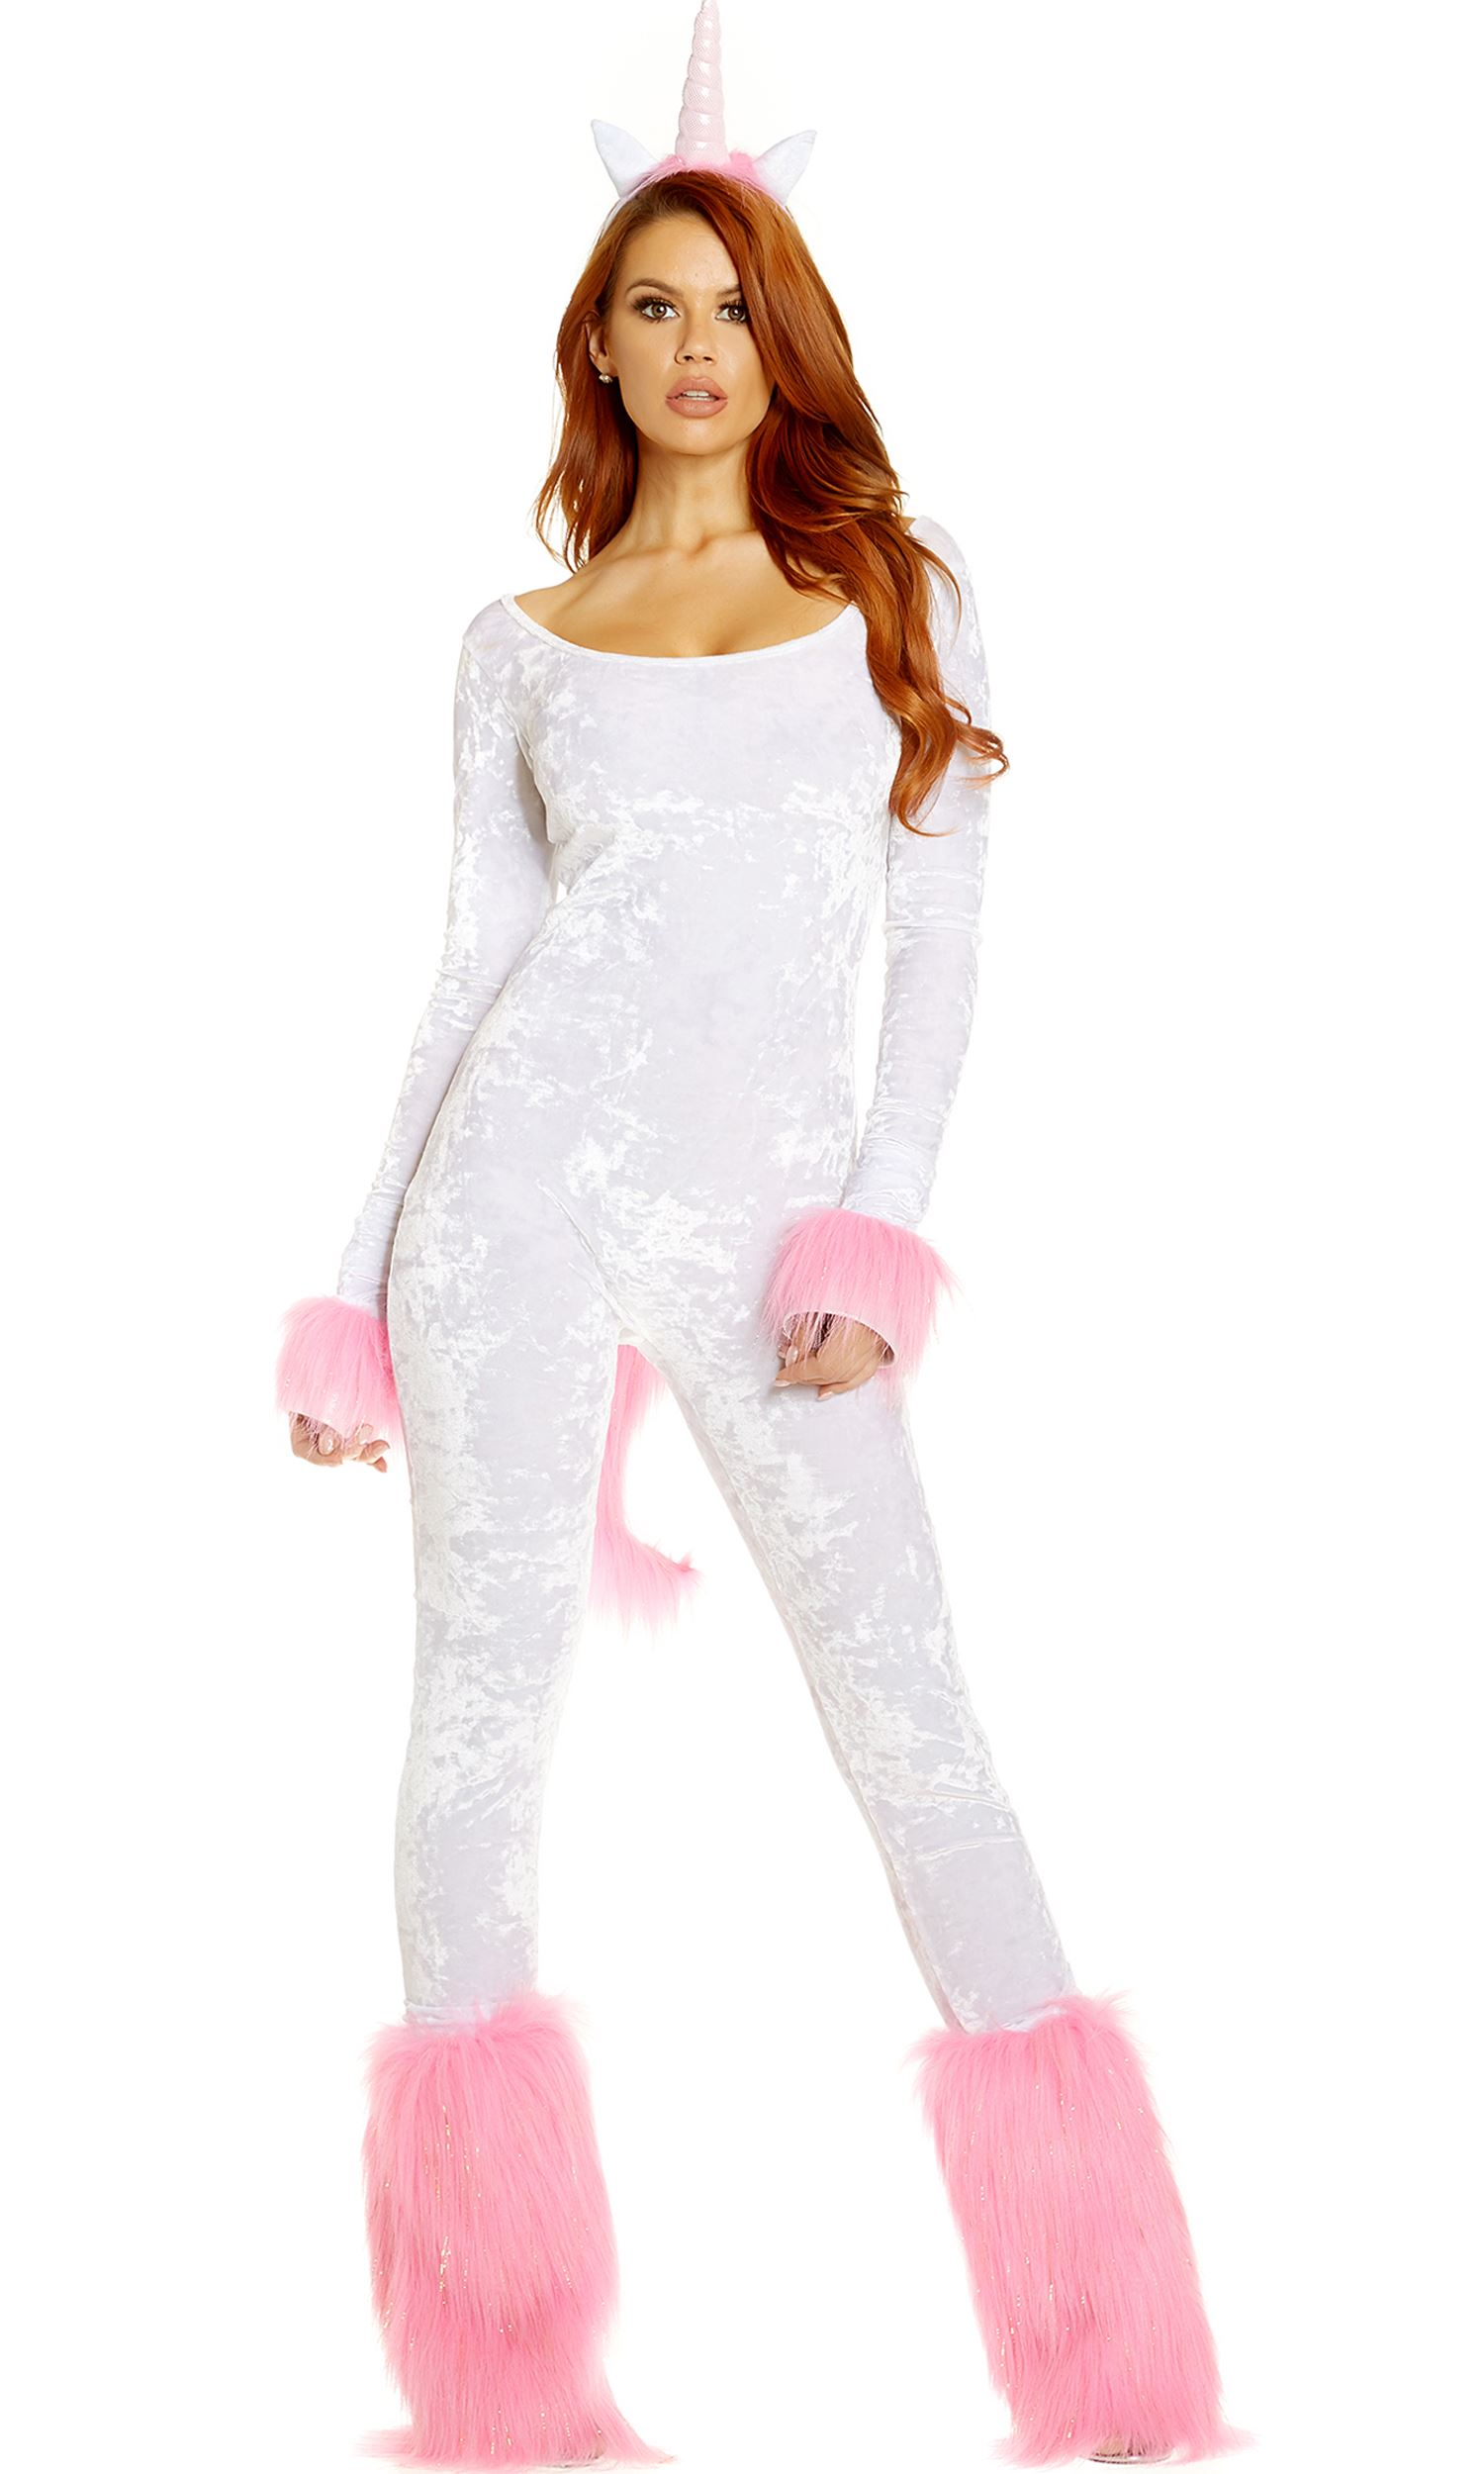 Adult Unicorn Bodysuit Woman Costume 73 99 The Costume Land